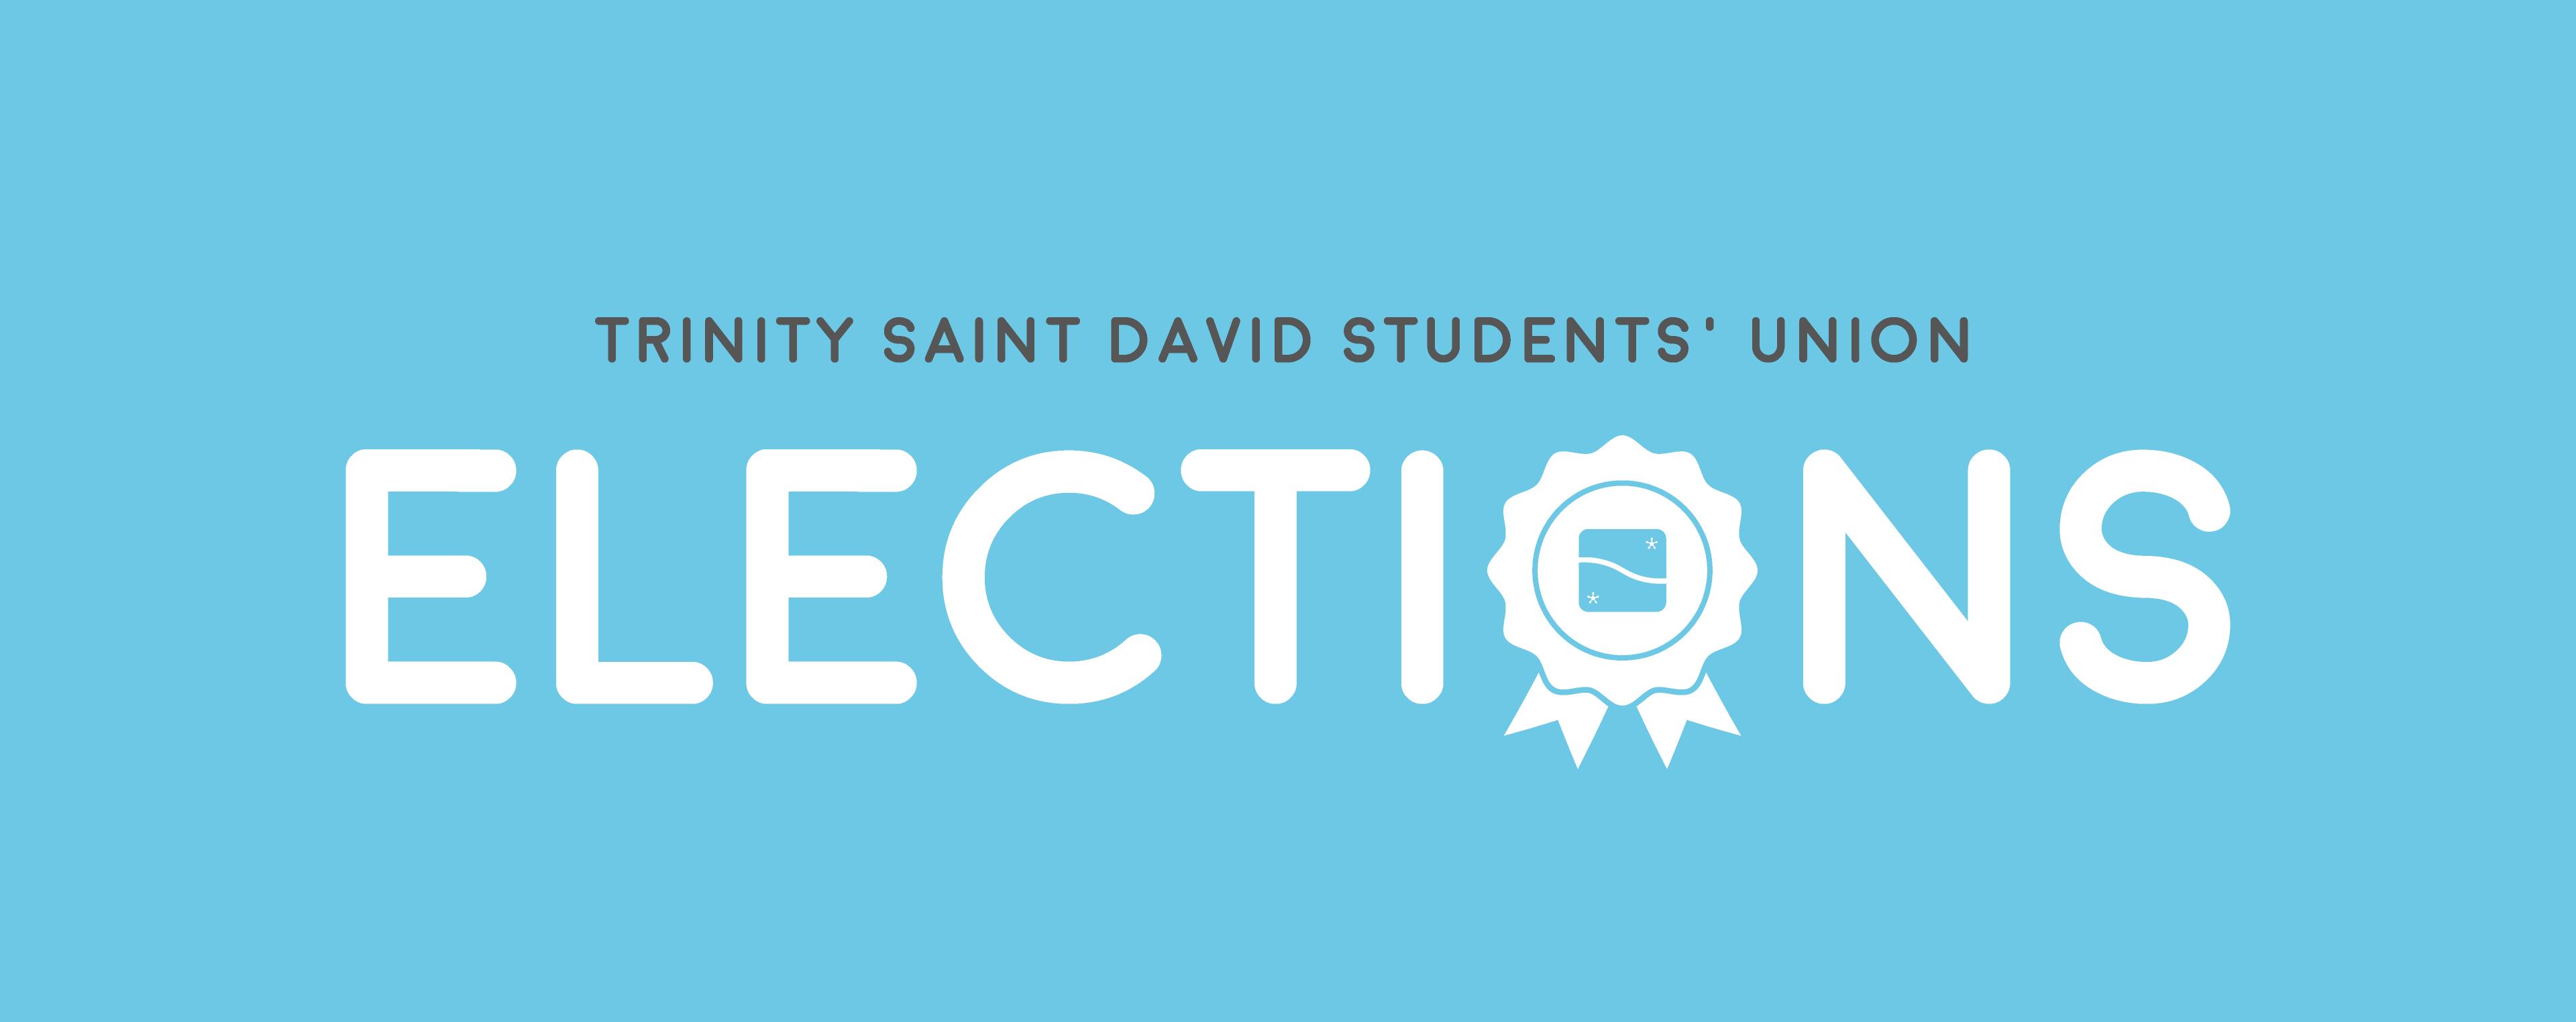 Tsdsu elections